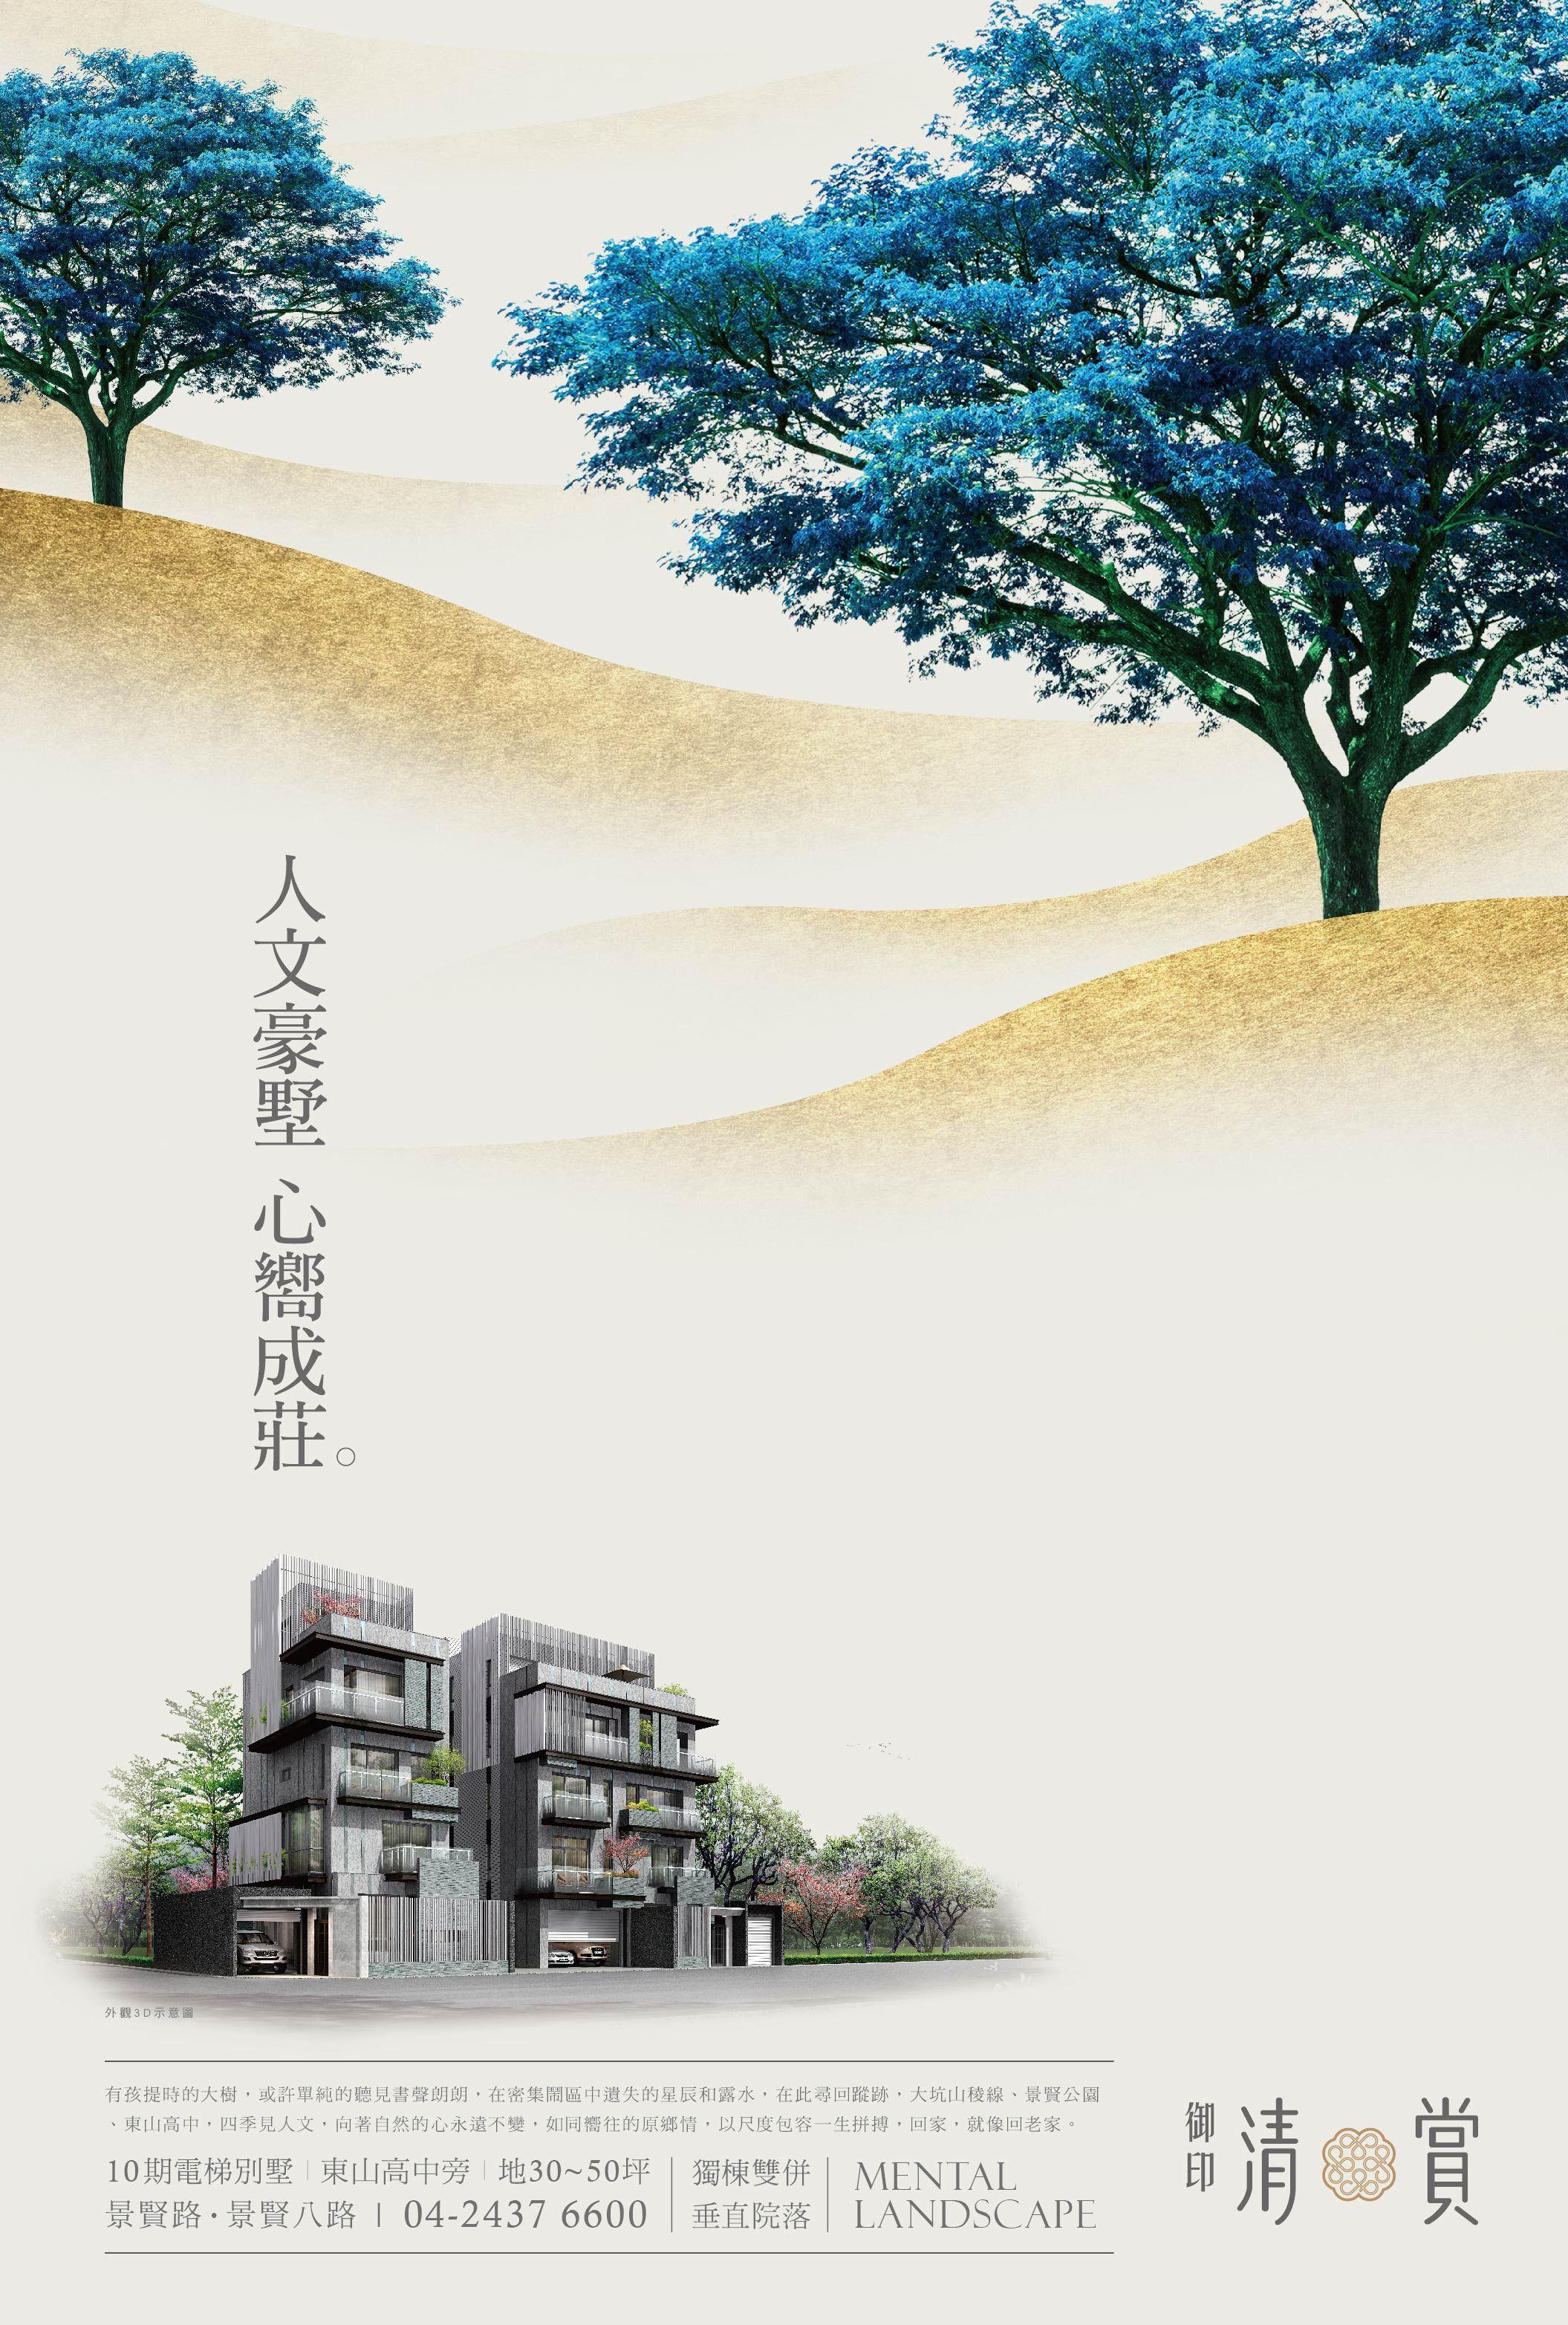 樸白設計 房產廣告 御印清賞 預售時期系列稿 real estate ads grafic design poster design